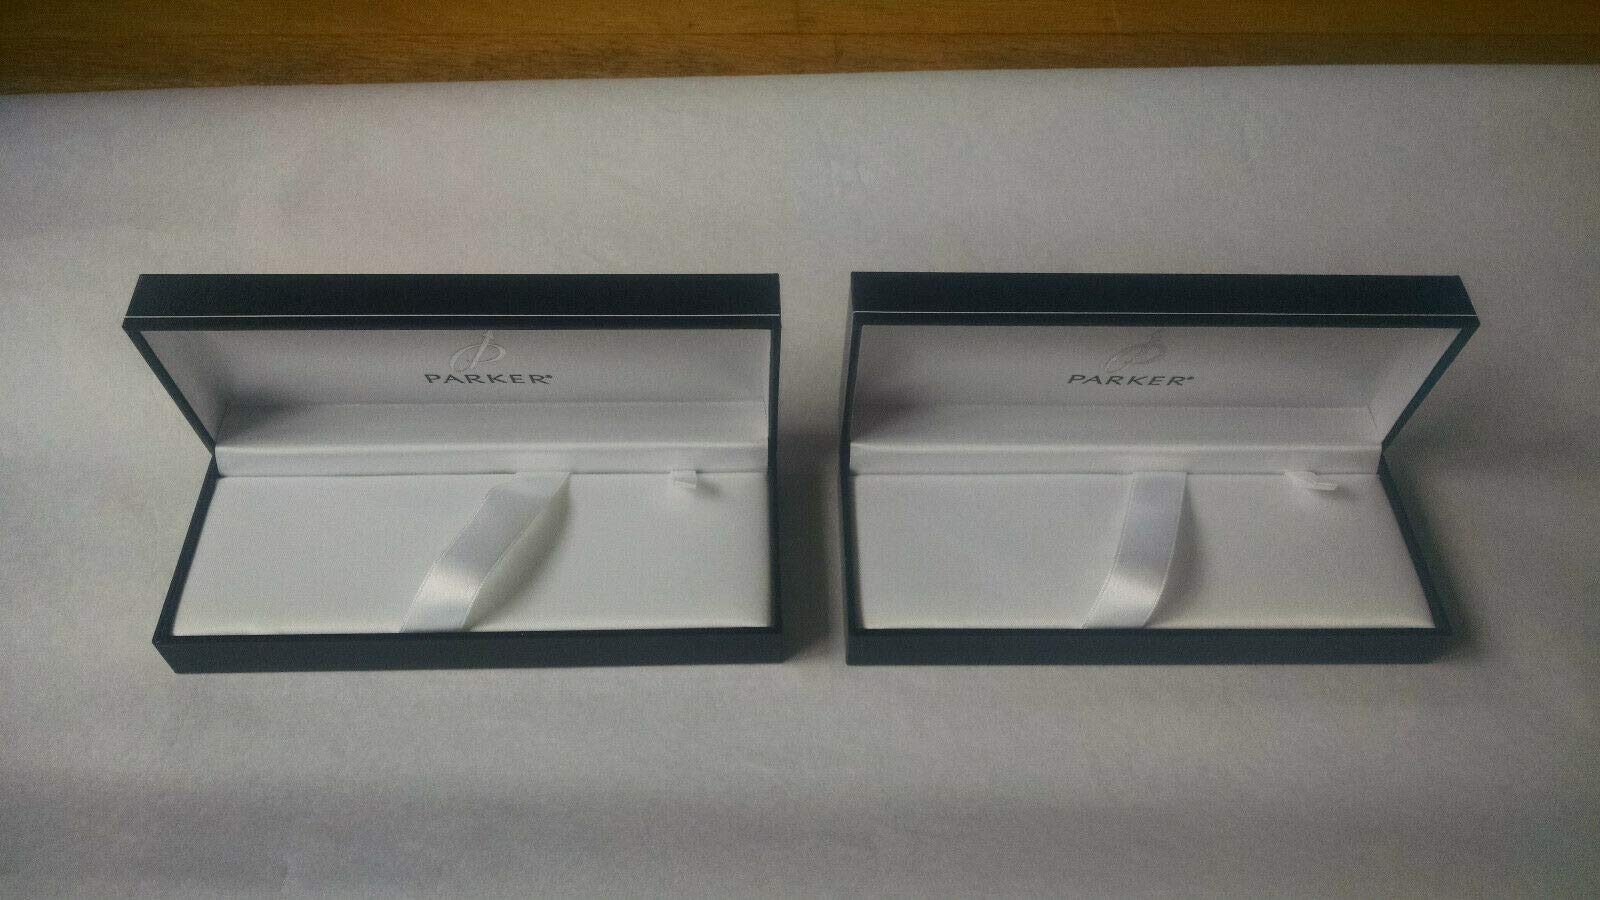 Set of 2 Parker Luxury Black Pen Boxes Empty Gift Box & Guarantee